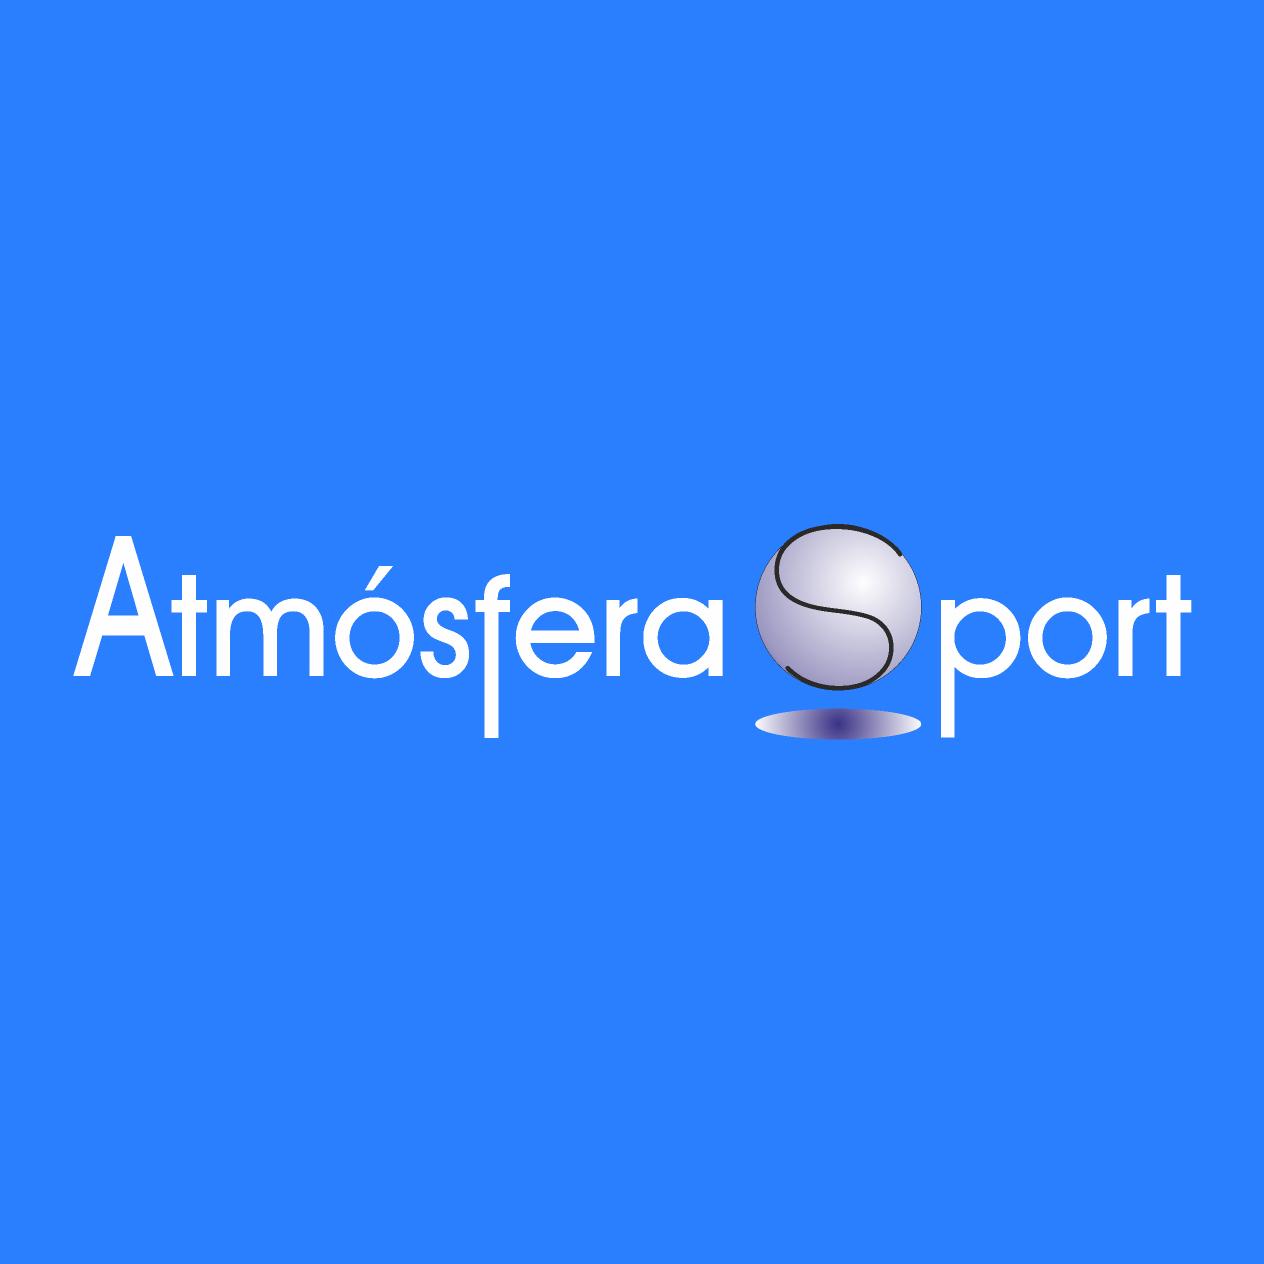 Atmosfera Sport